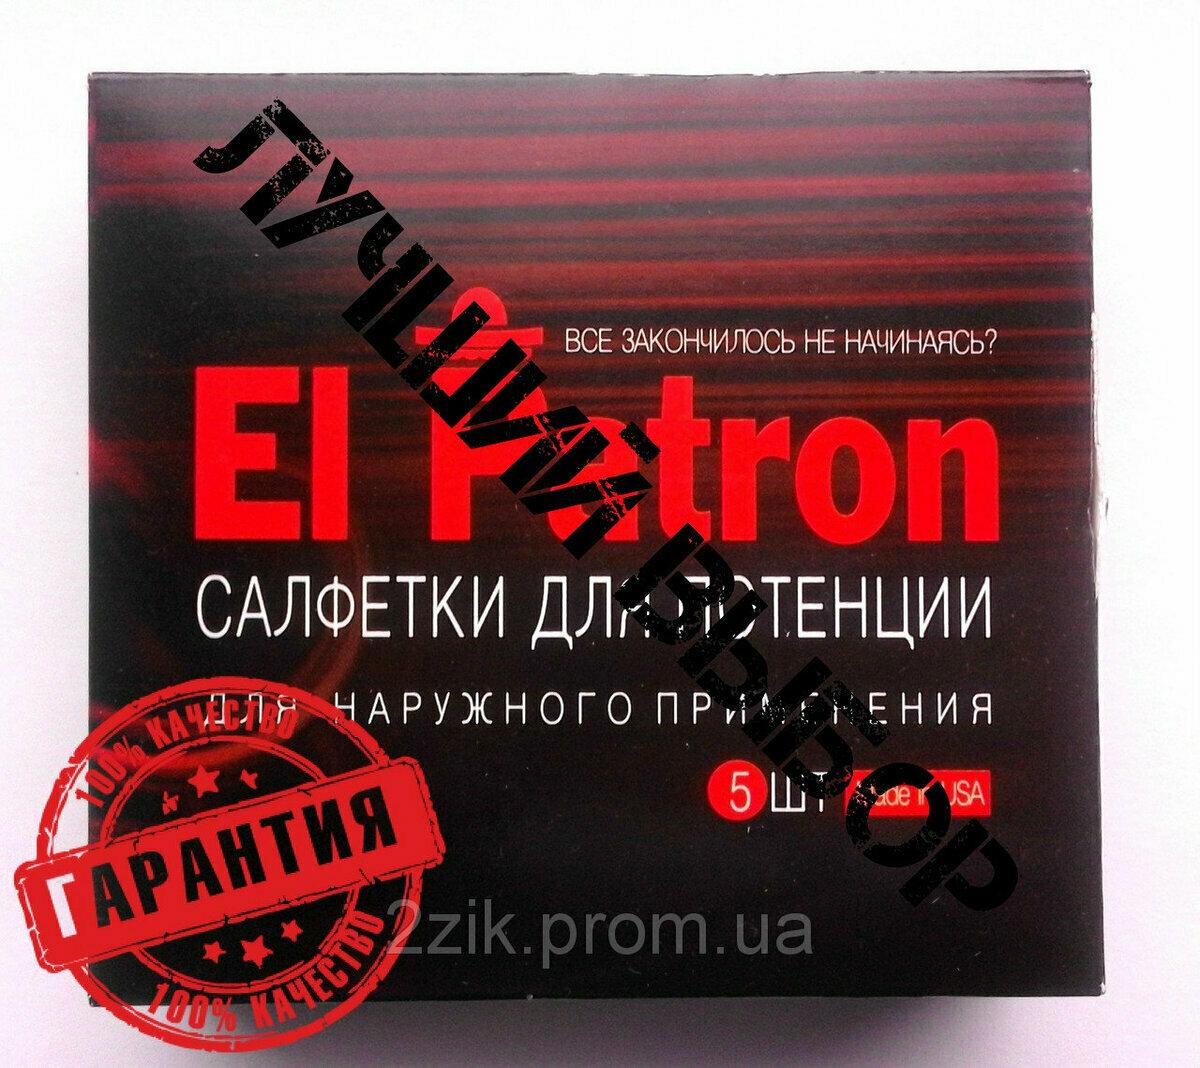 El Patron - салфетки для потенции в Серпухове